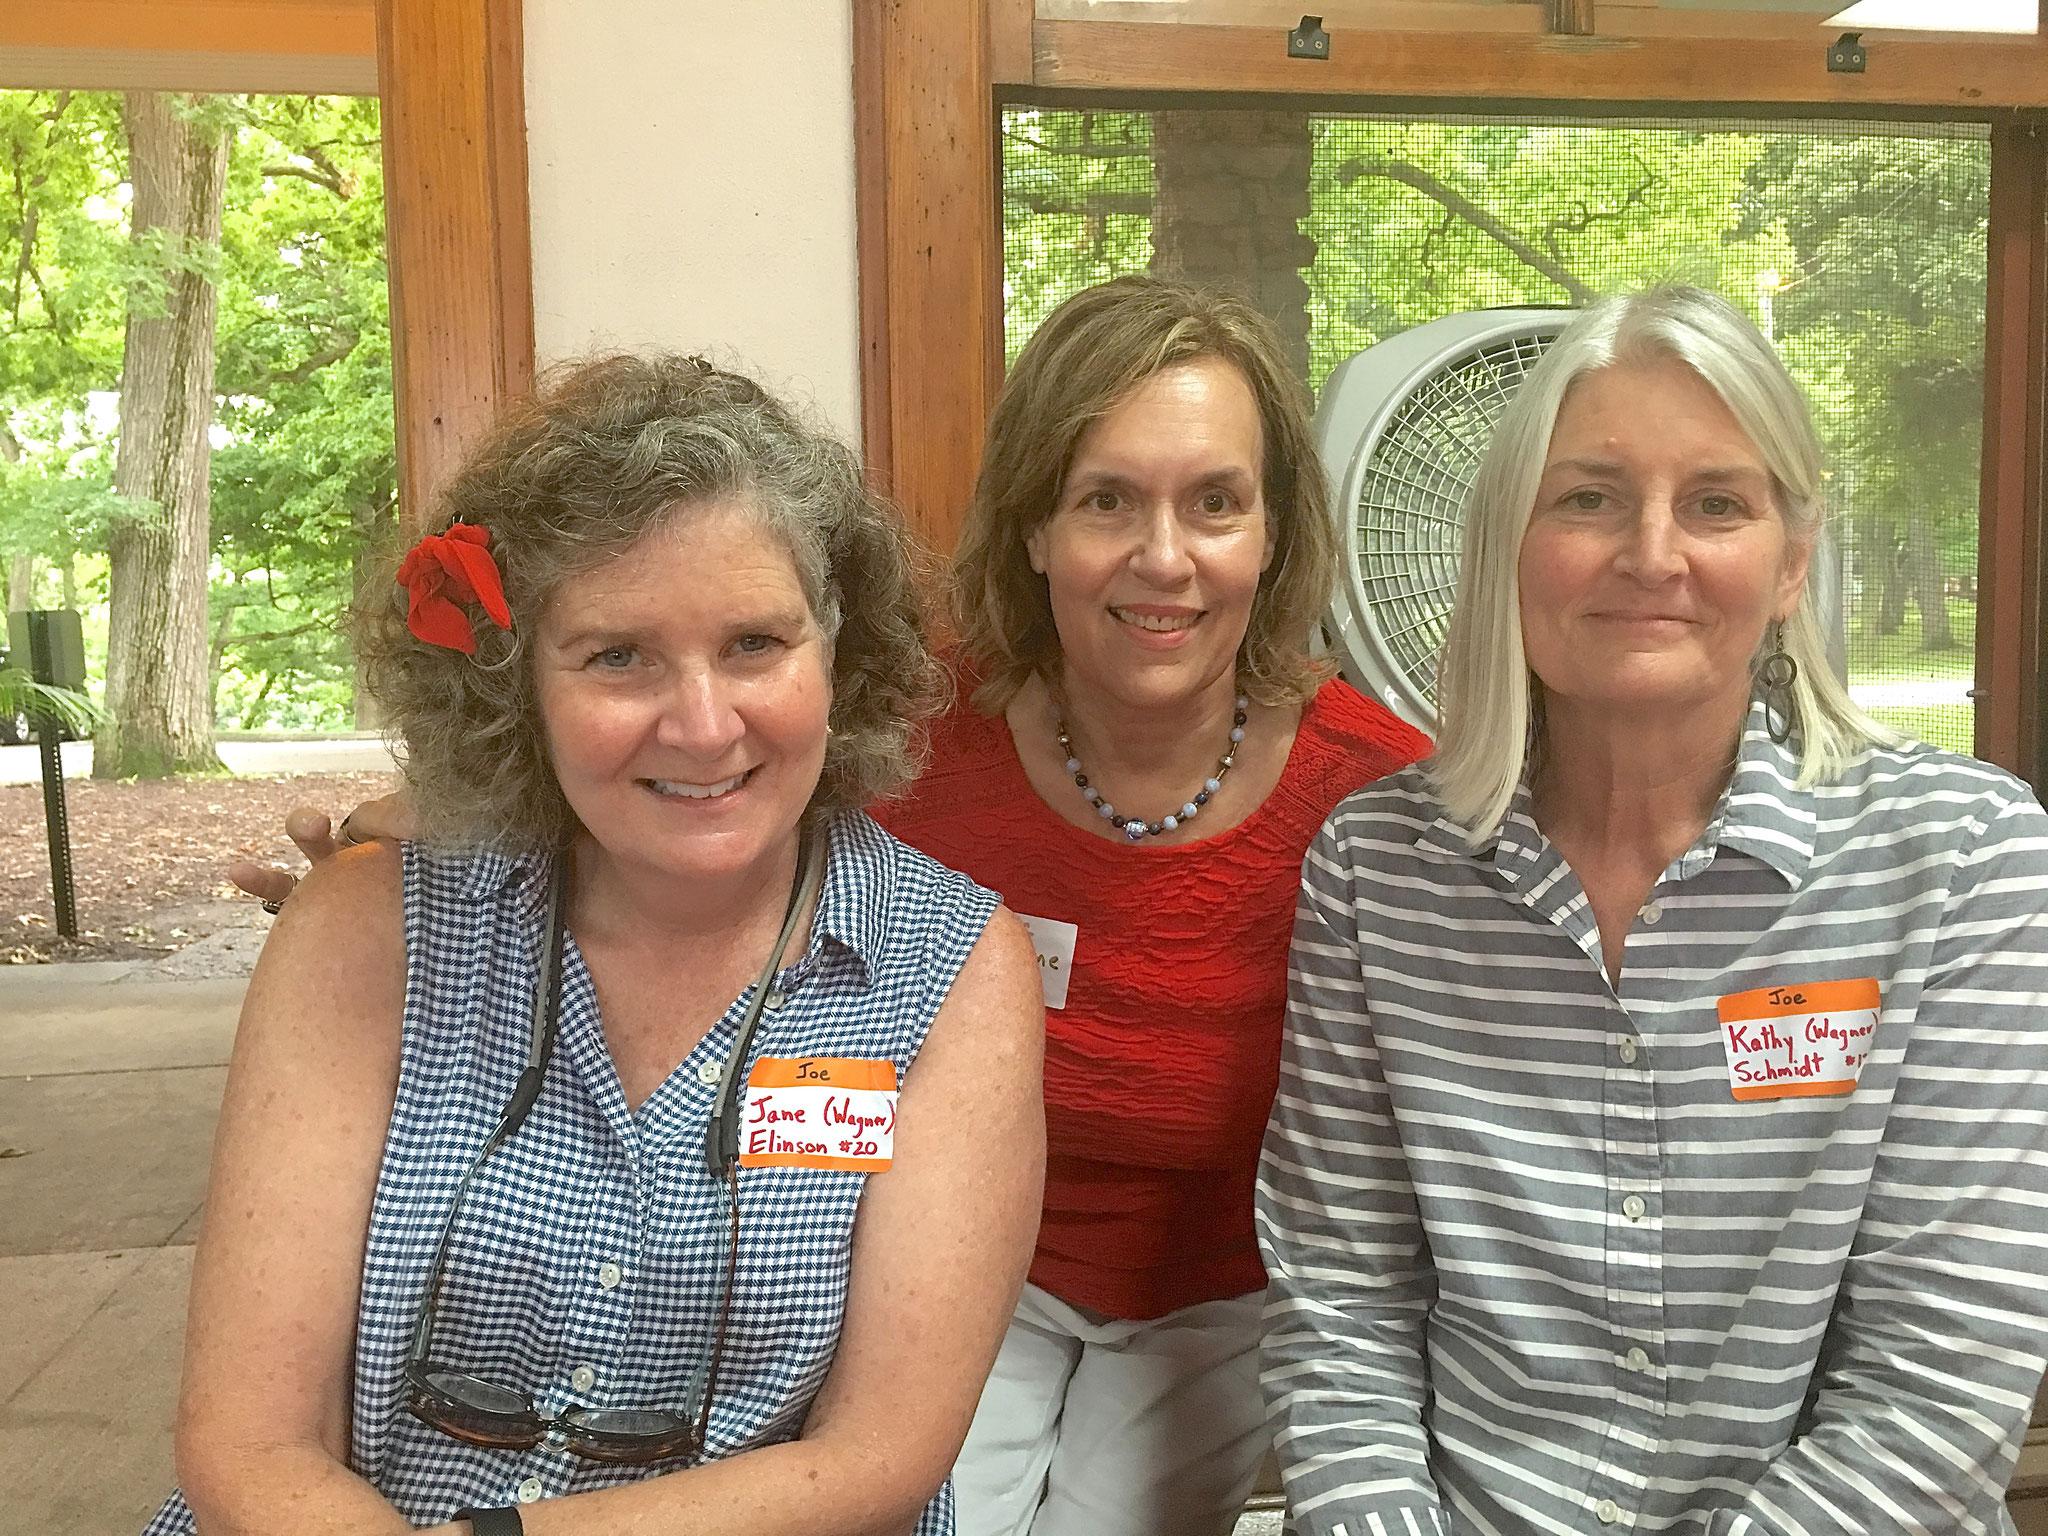 Jane Elinson with Lorraine Gudas and Kathy Wagner